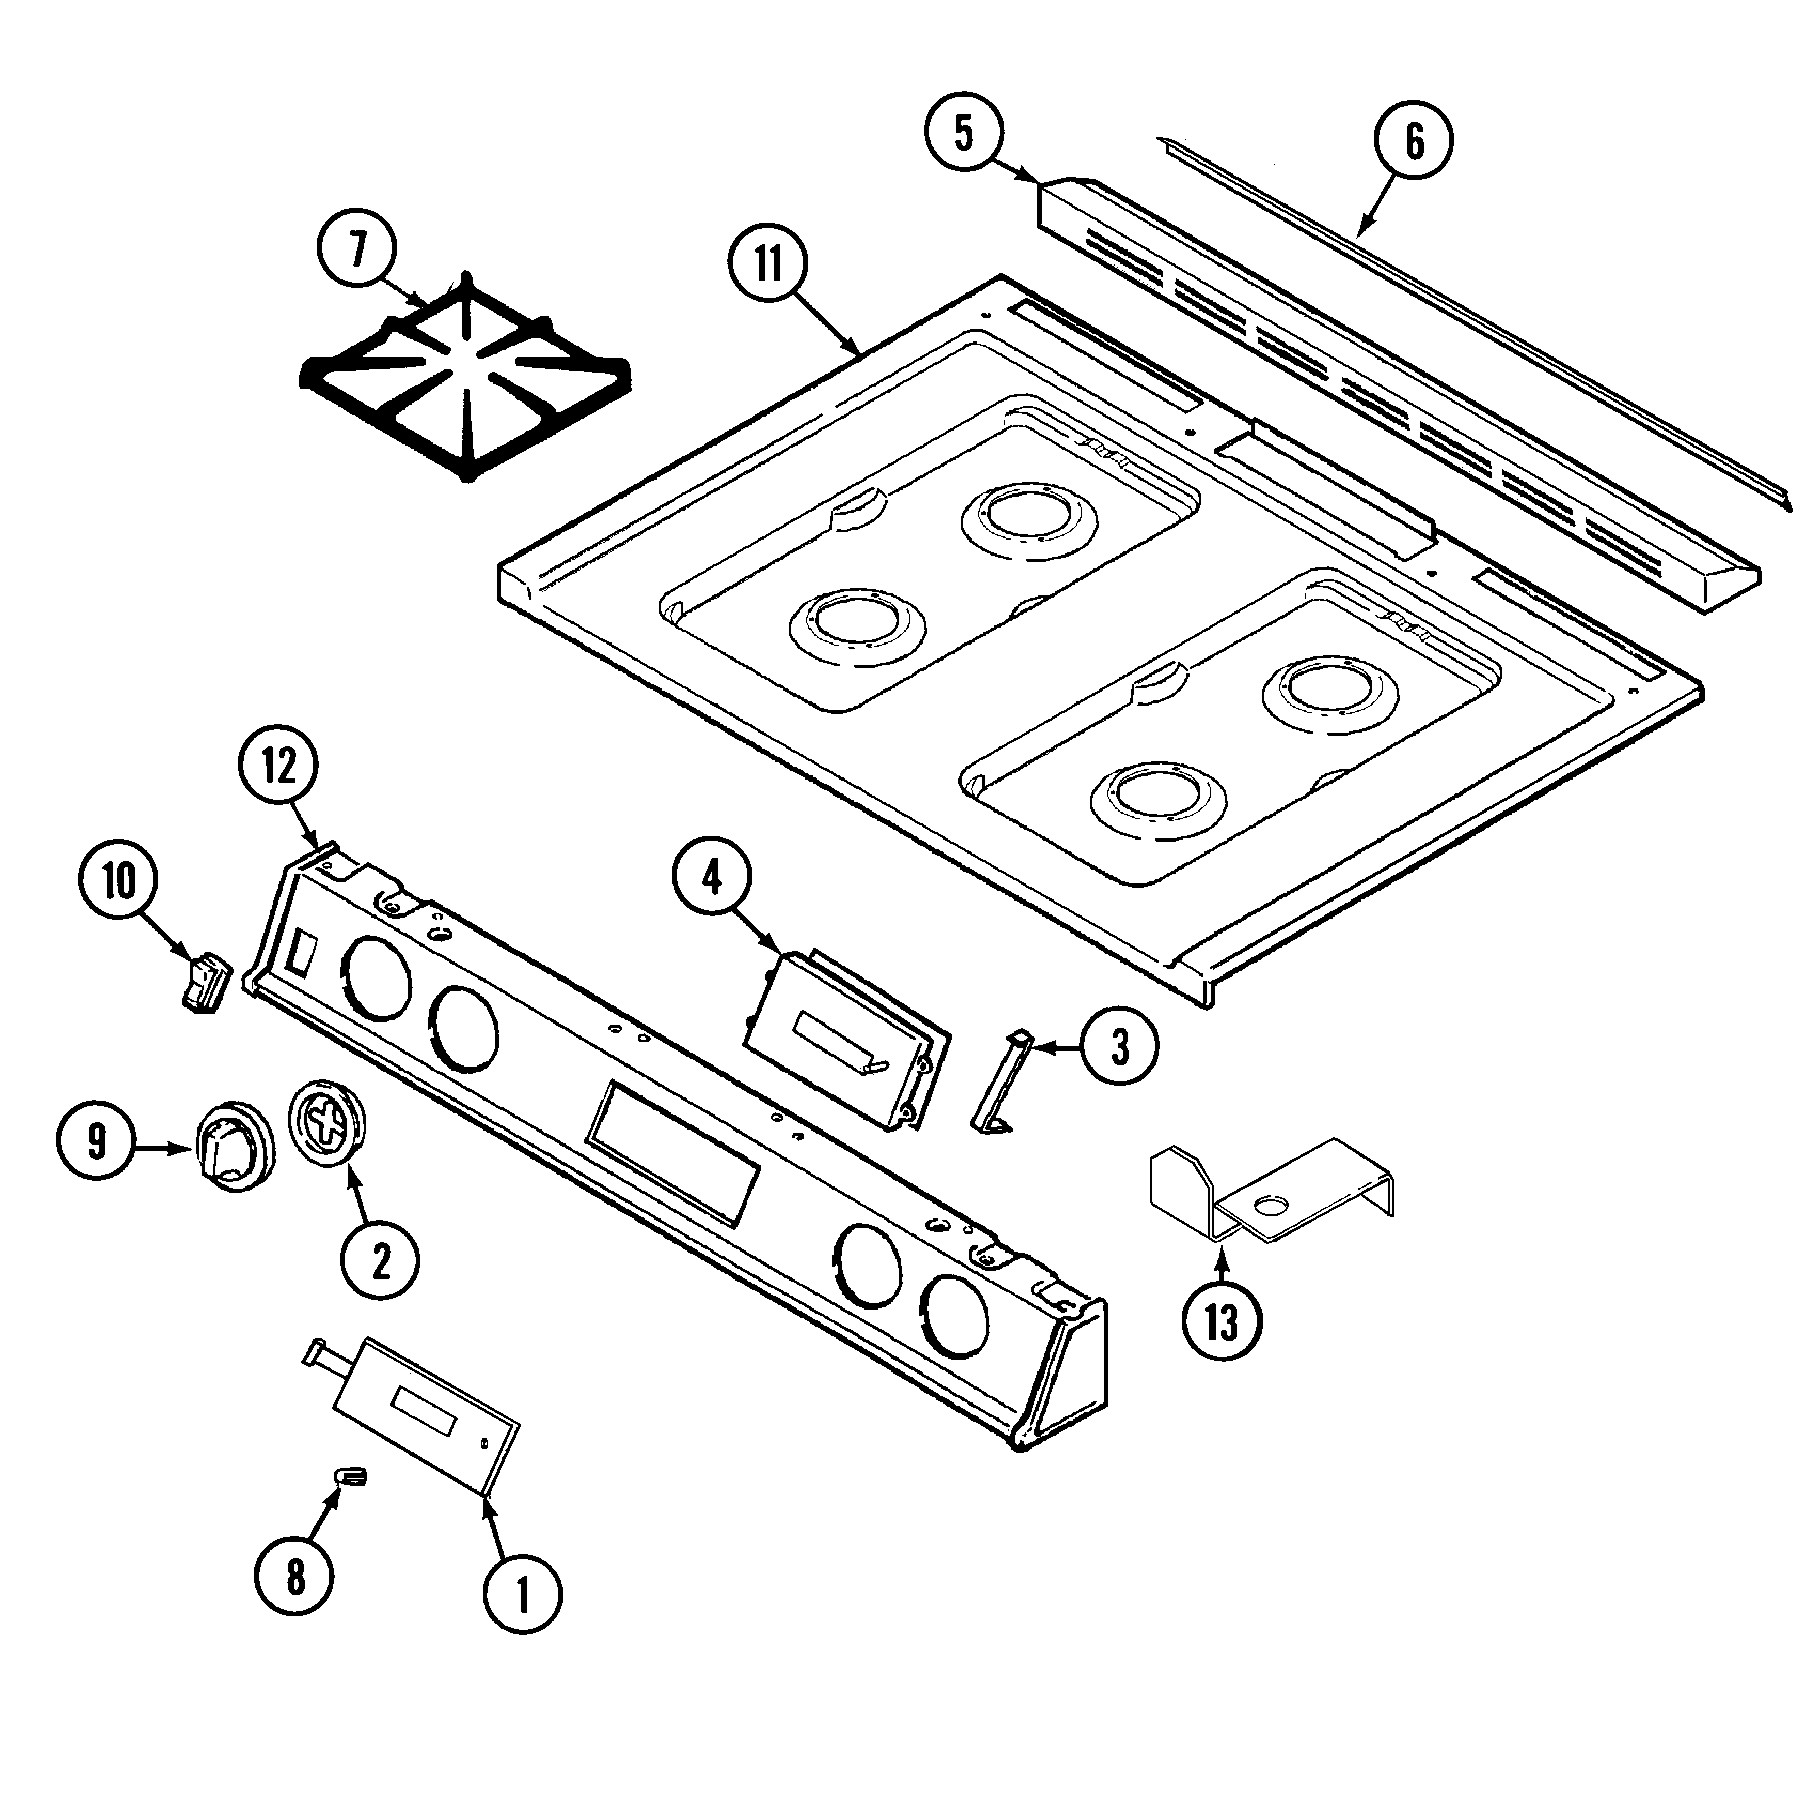 Ge Washing Machine Parts Diagram Magic Chef 6498vra Gas Range Timer Stove Clocks and Appliance Timers Of Ge Washing Machine Parts Diagram